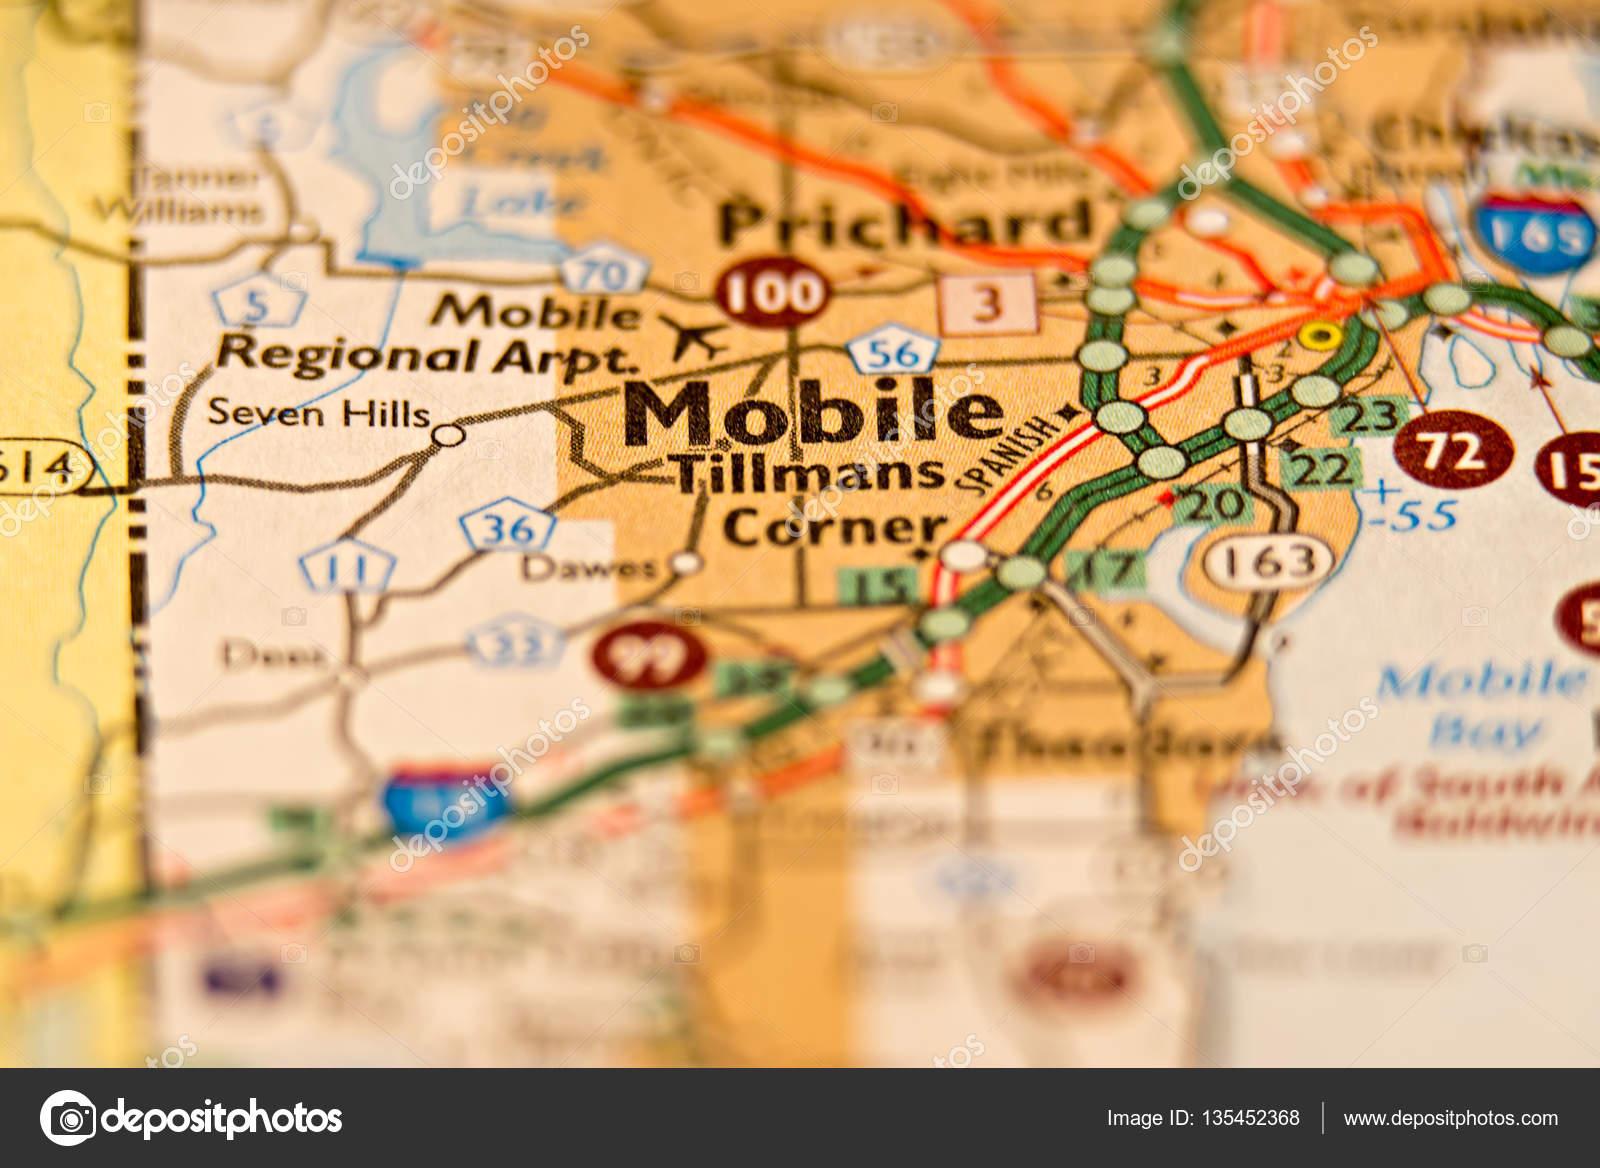 Mobile alabama area map — Stock Photo © digidream #135452368 on texas map, usa map, mobile iowa map, mobile county map, poplarville mississippi map, huntsville area zip code map, mobile virginia map, mobile al, city of opp al map, glendale arizona on a map, san antonio map, charleston south carolina map, santa ana california on a map, lansing michigan on the map, ala city map, buffalo new york on the map, little rock arkansas map, mobile co map, mobile orange beach map, kansas city missouri map,